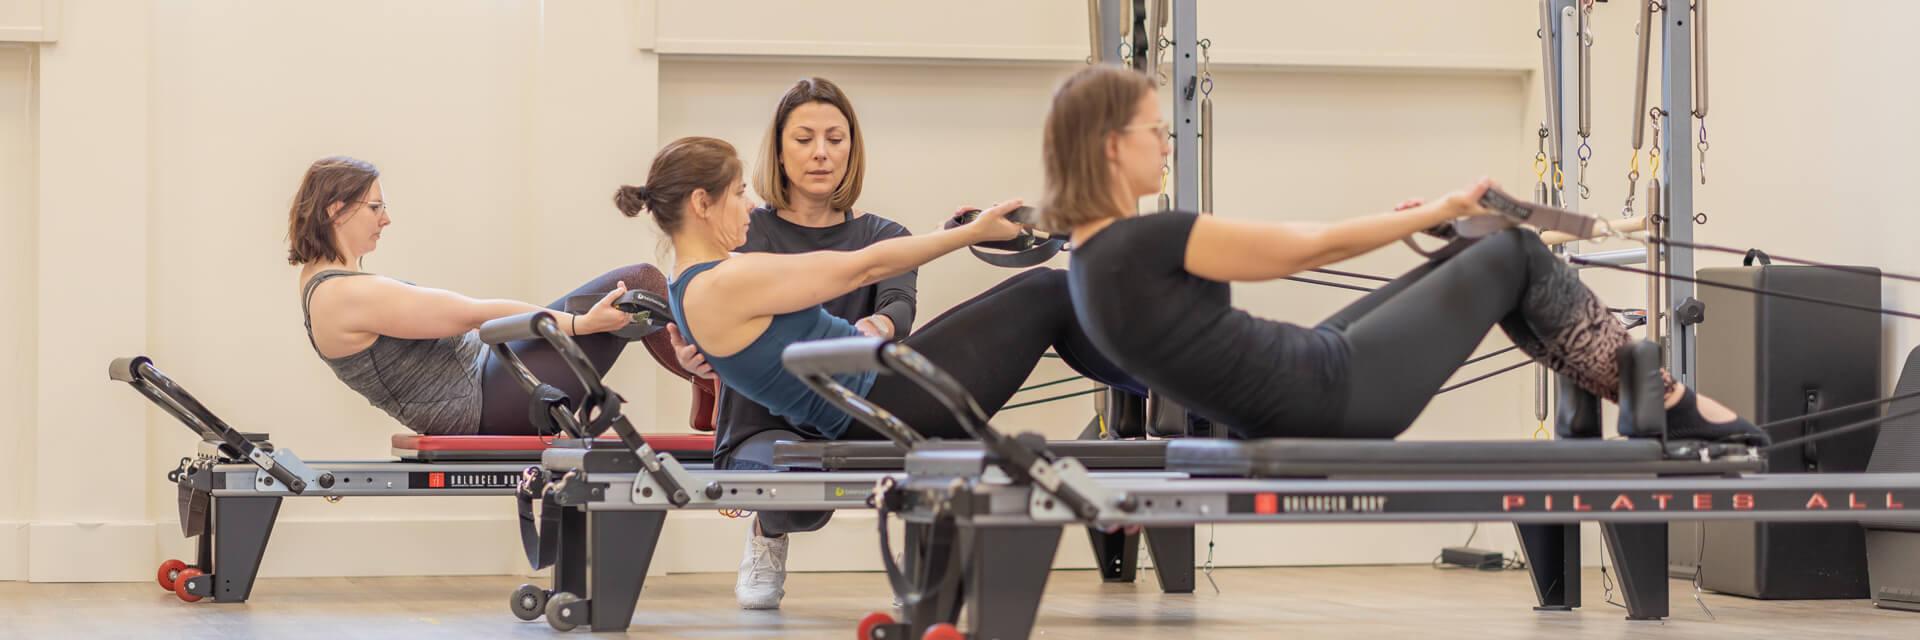 Inna-Gulak-inna-Gulak-Pilates-Pilates-venlo-Pilates-groepslessen-Personal-Training-Pilates-Reformer-Pilates-Mat-02